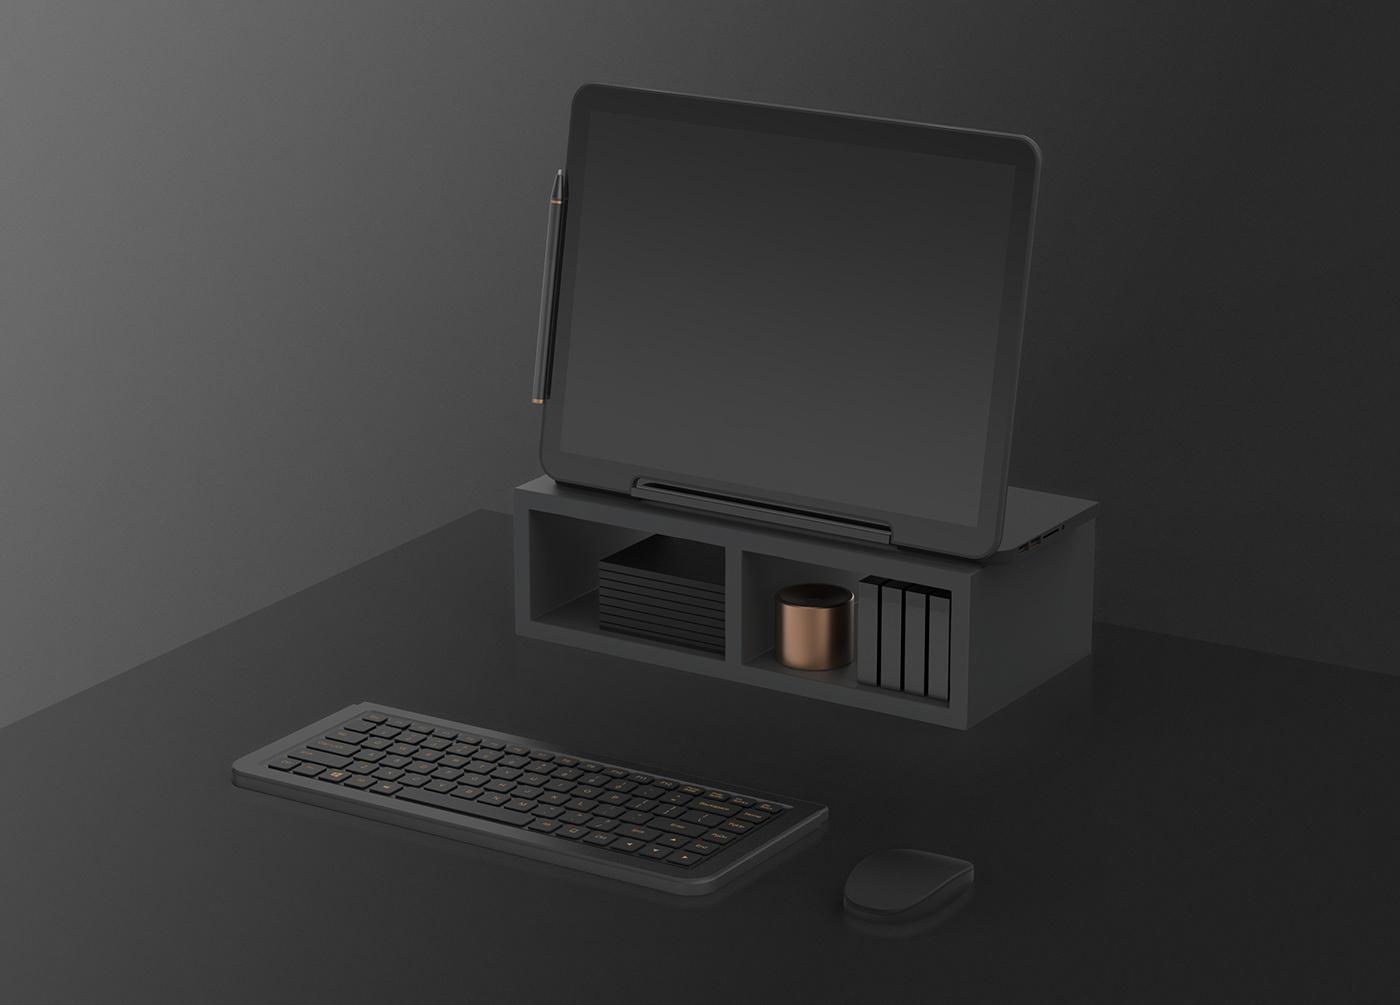 PC tablet Laptop sketching IT consumer electronics Electronics hybrid convertible wacom